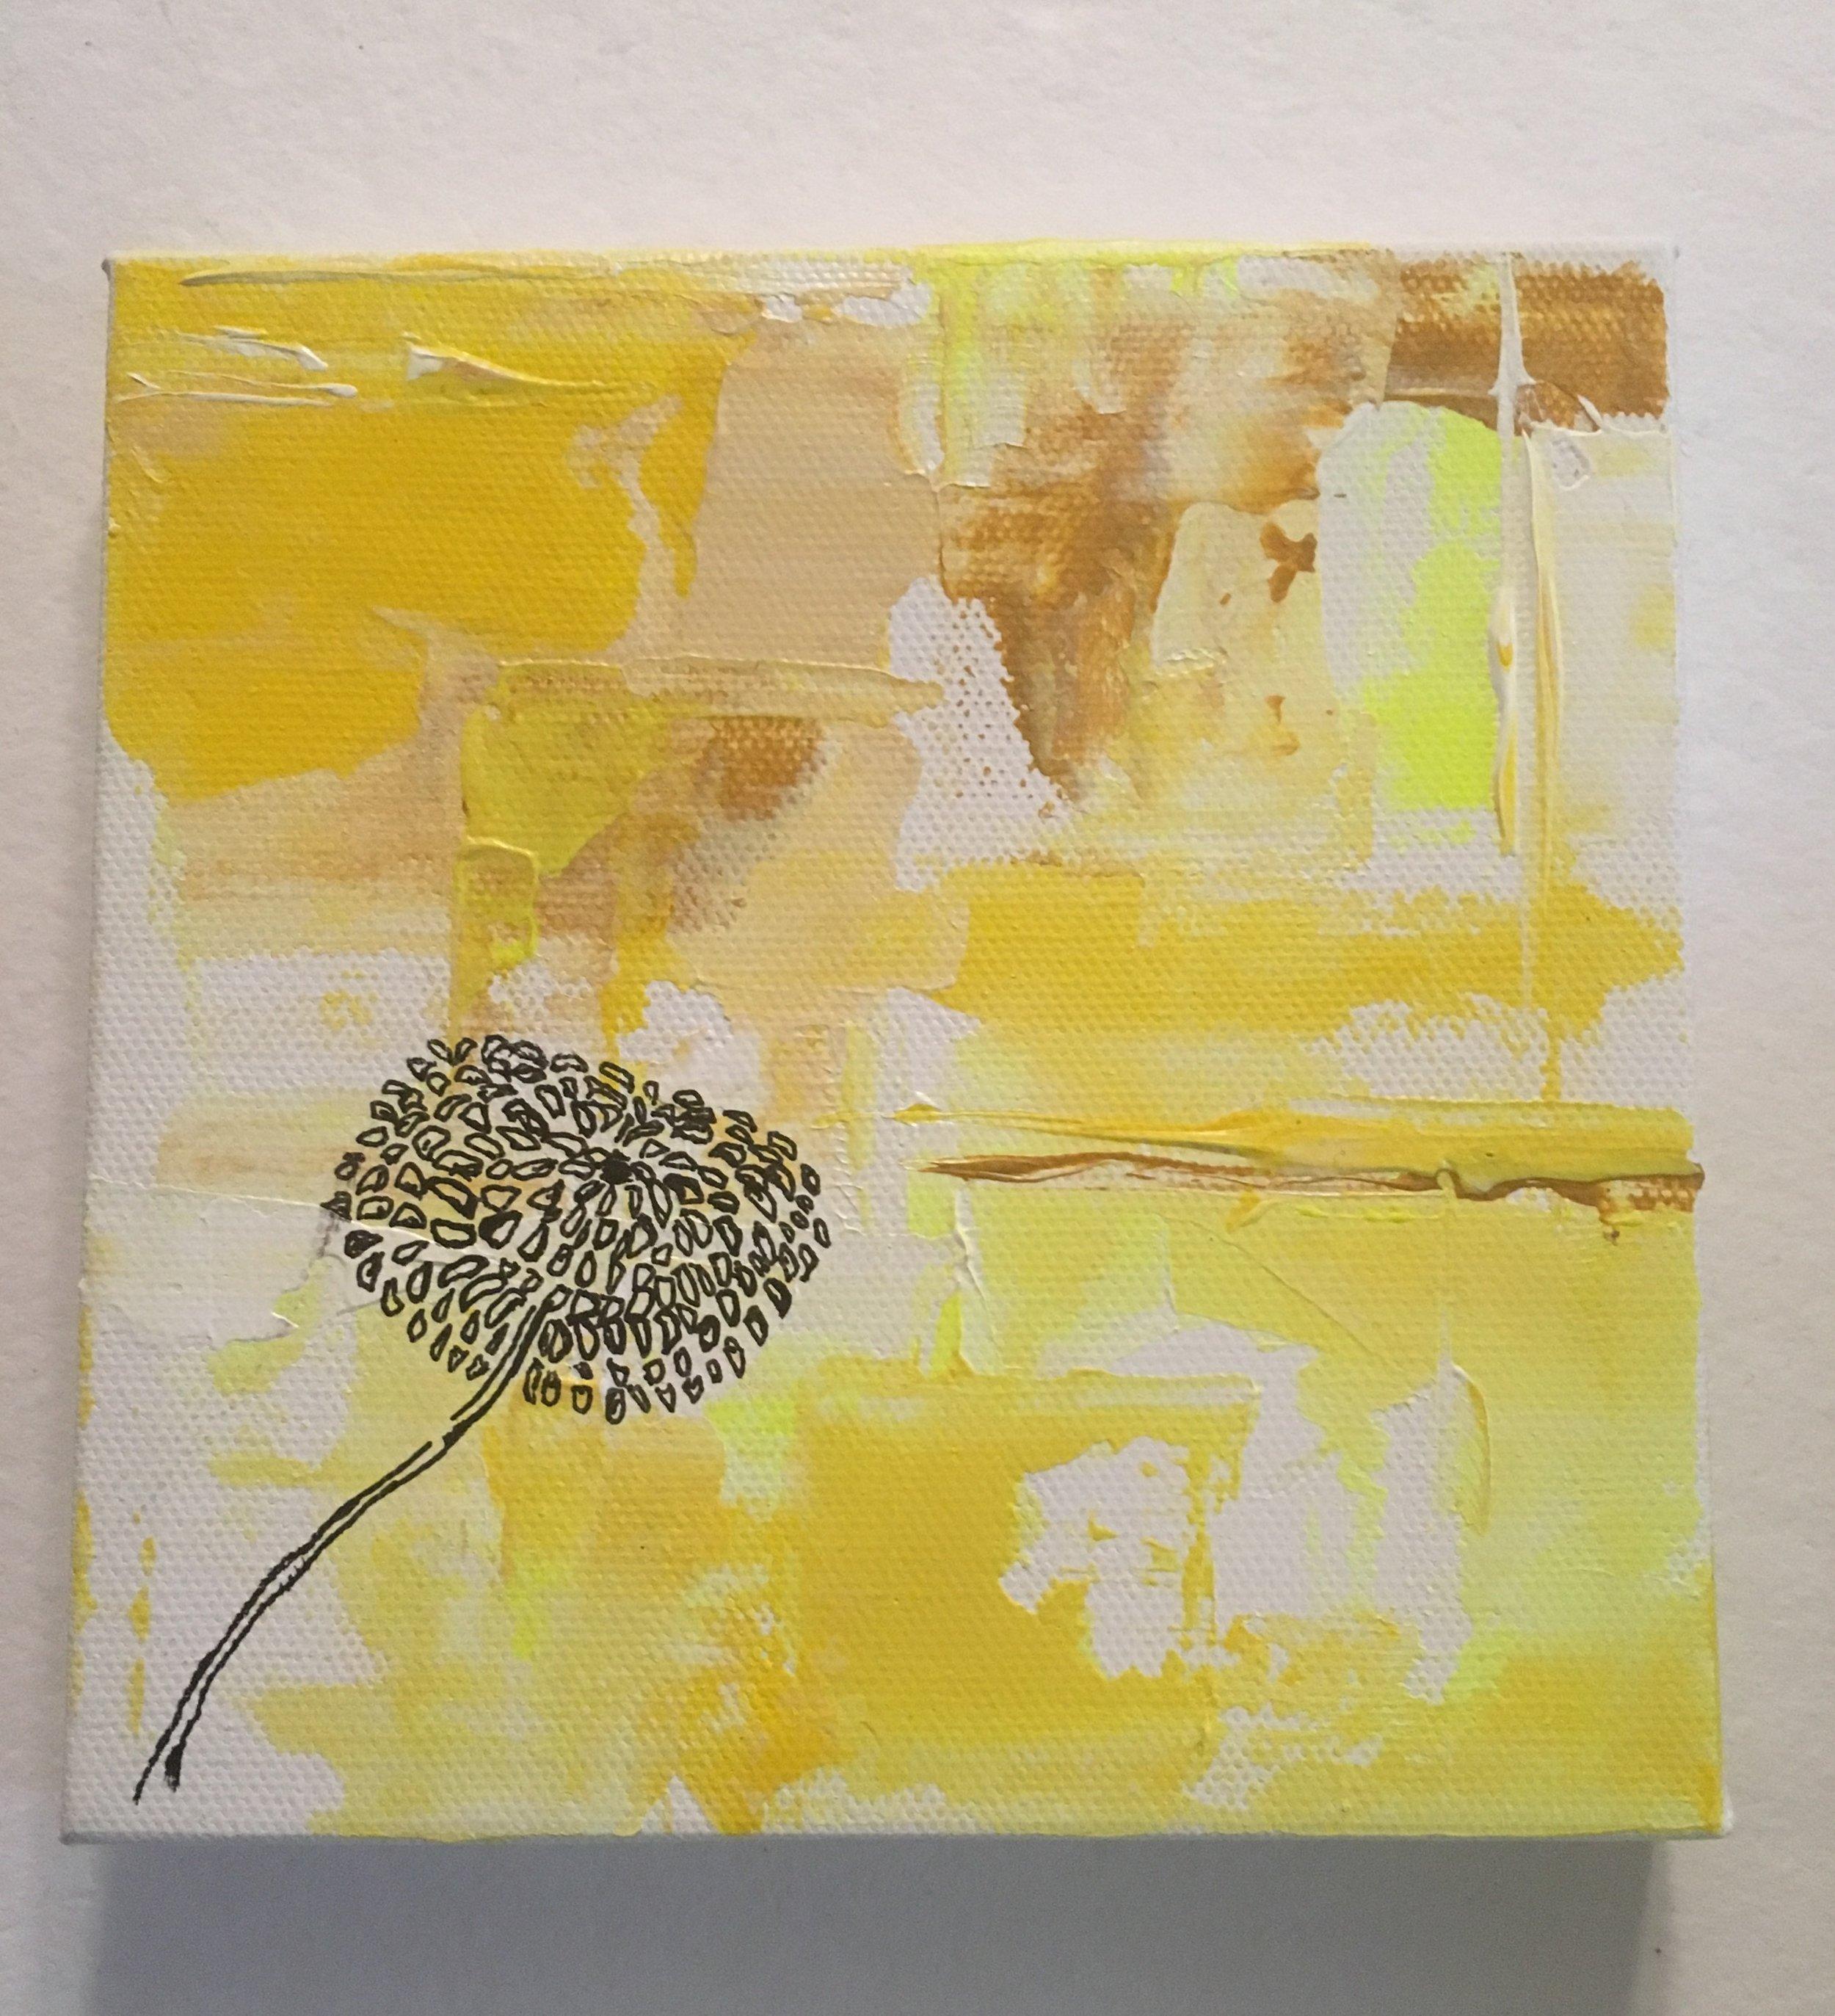 "Dandelion Shines-Acrylic & Mixed Media | Canvas | Palette Knife 6 X 6"""